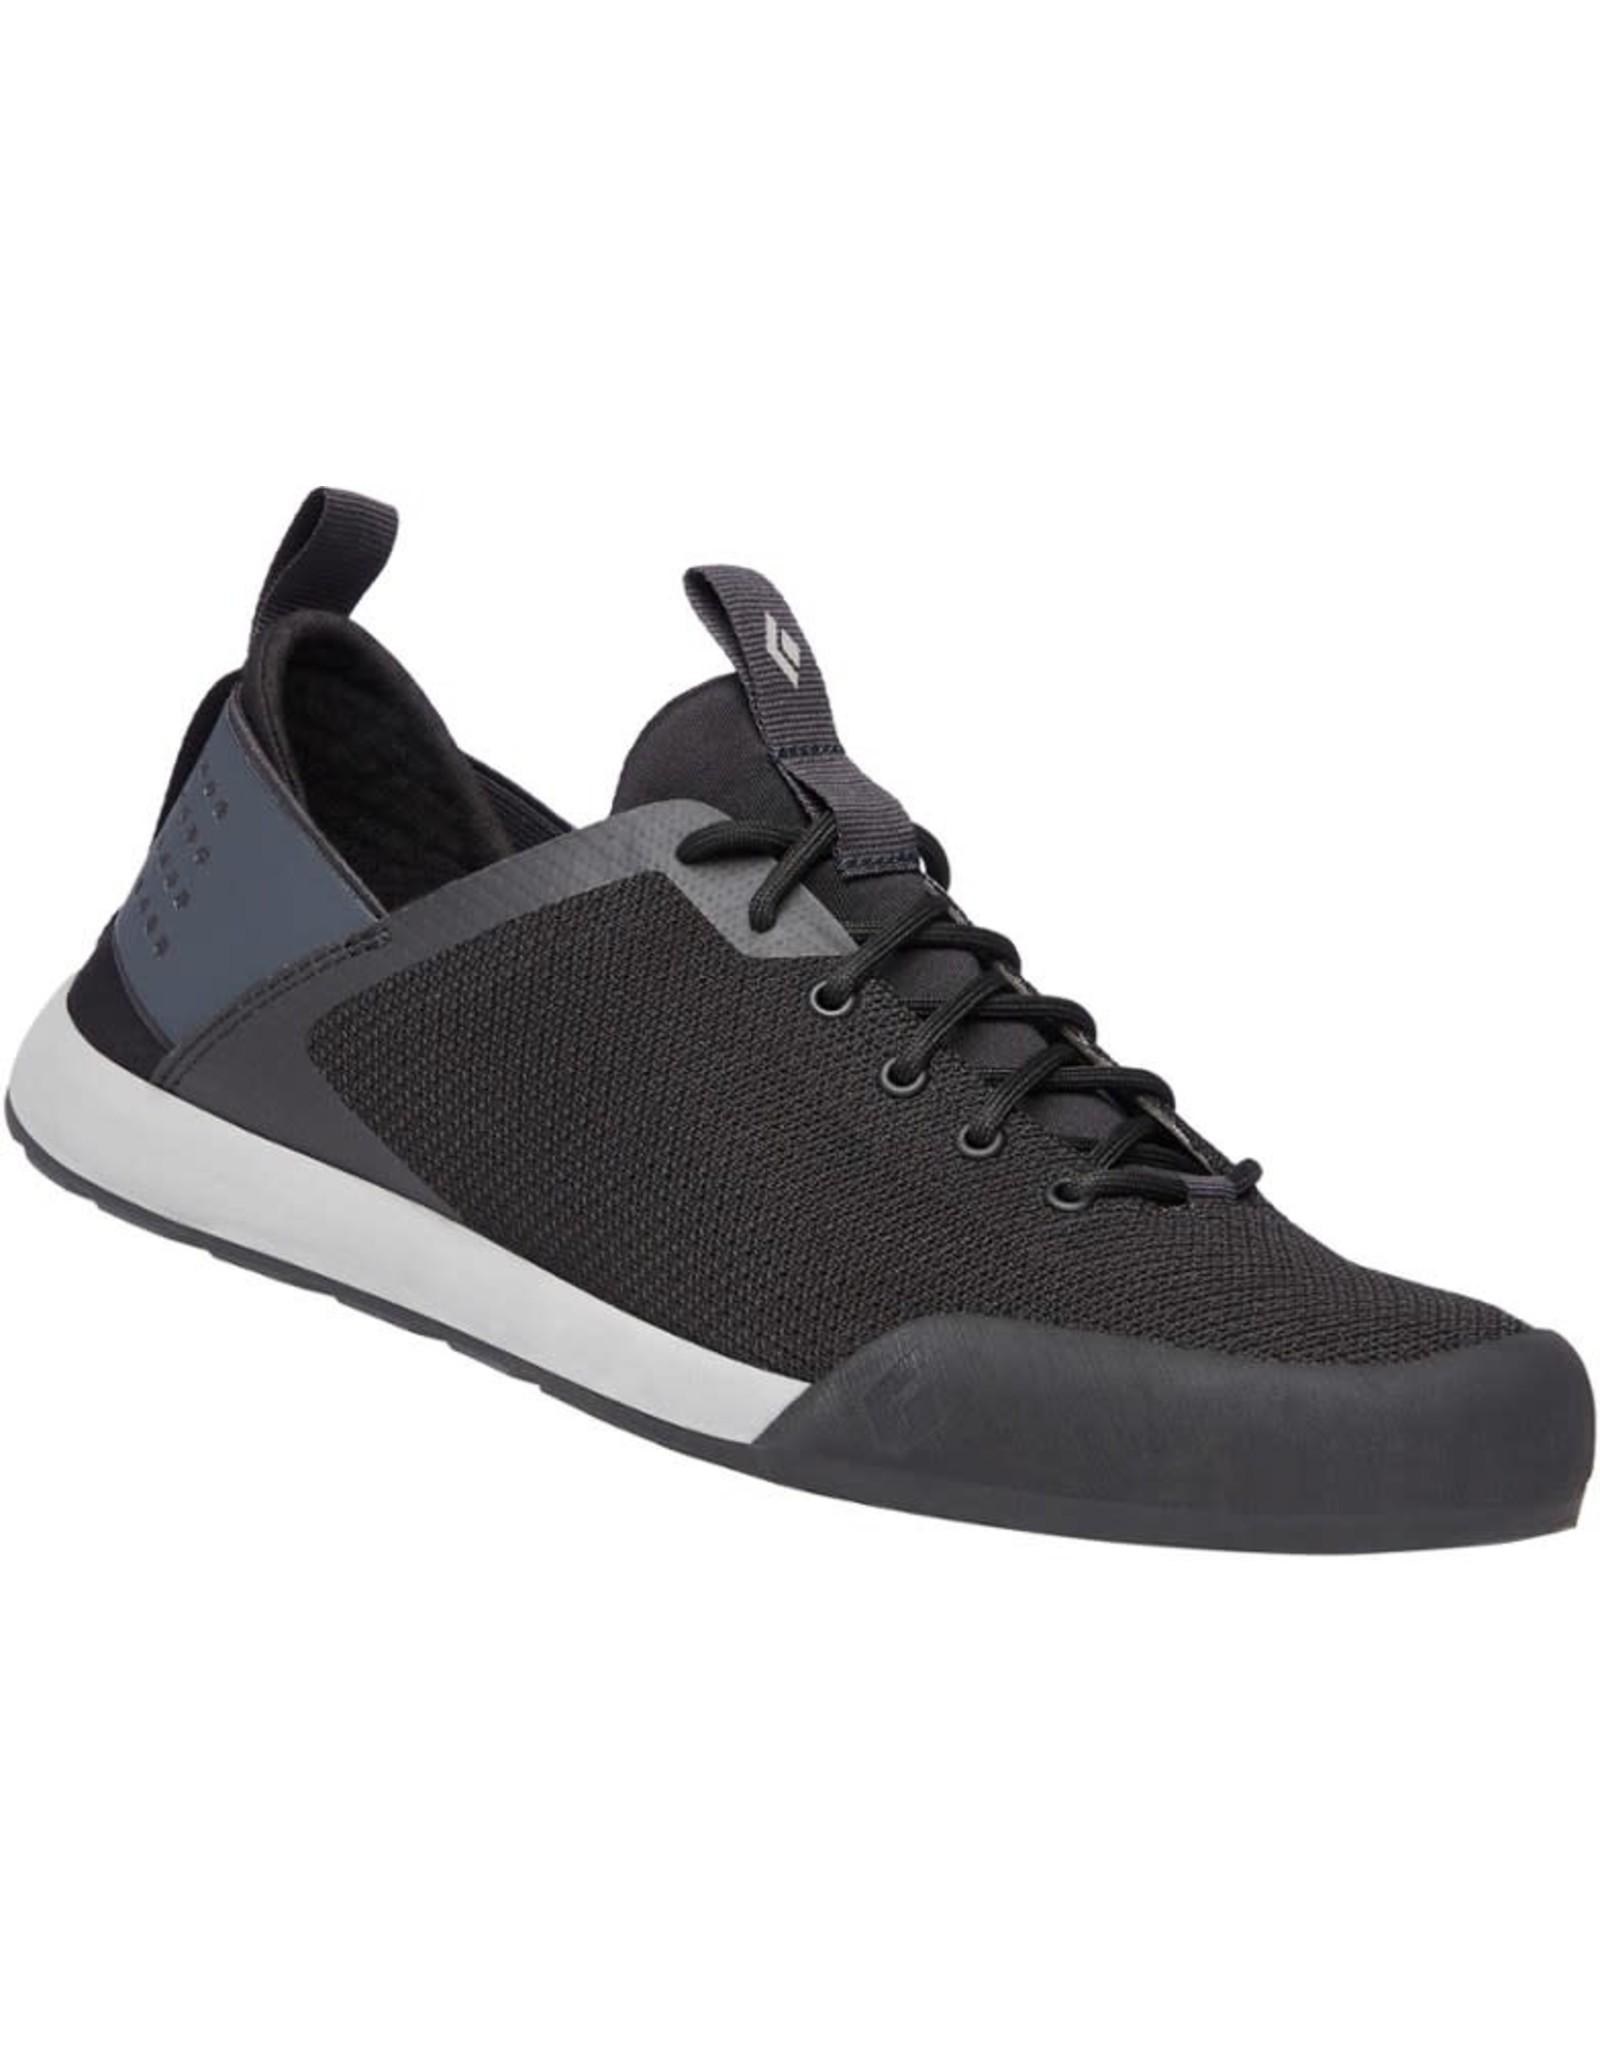 Black Diamond Session Approach shoes